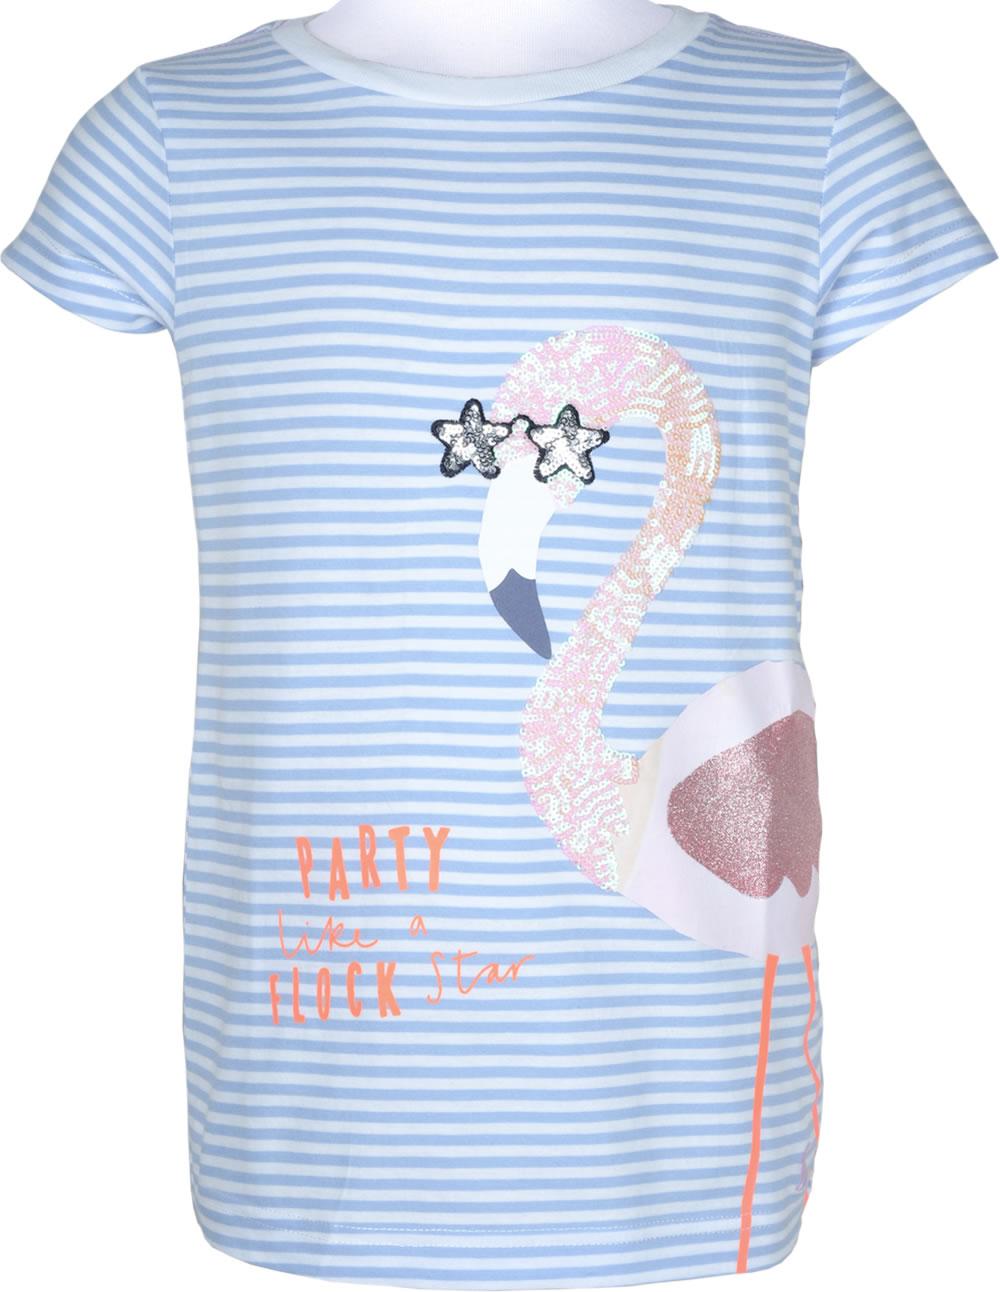 best website 6264e 45b69 Tom Joule T-Shirt Kurzarm ASTRA FLAMINGO blue stripe 203030